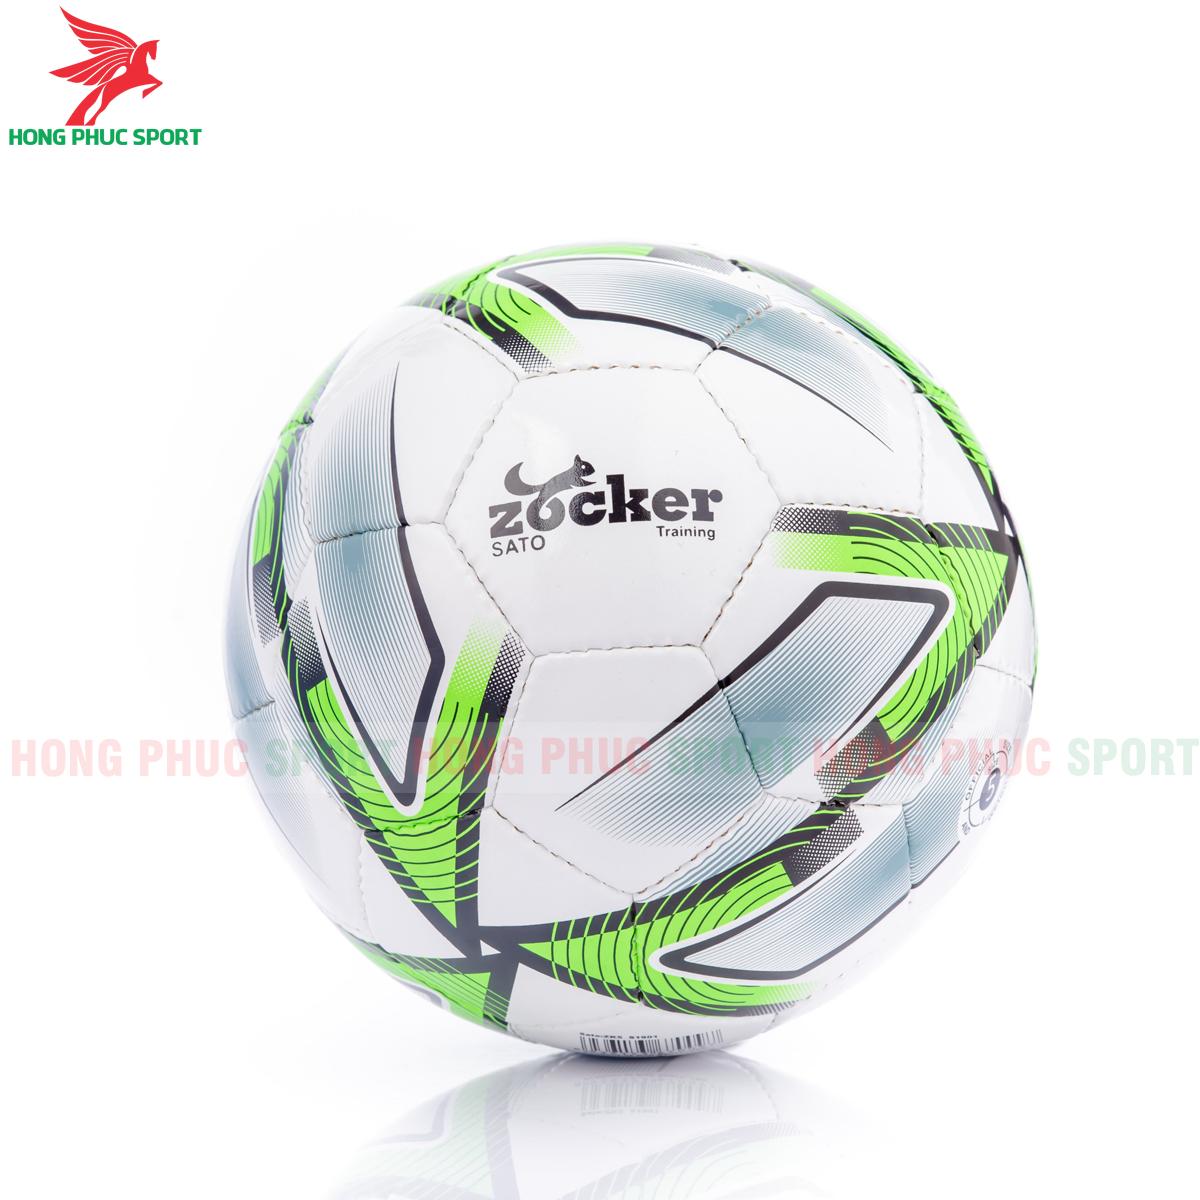 https://cdn.hongphucsport.com/unsafe/s4.shopbay.vn/files/285/qua-bong-da-zocker-sato-s1901-mau-xanh-60751b4c8dab8.png